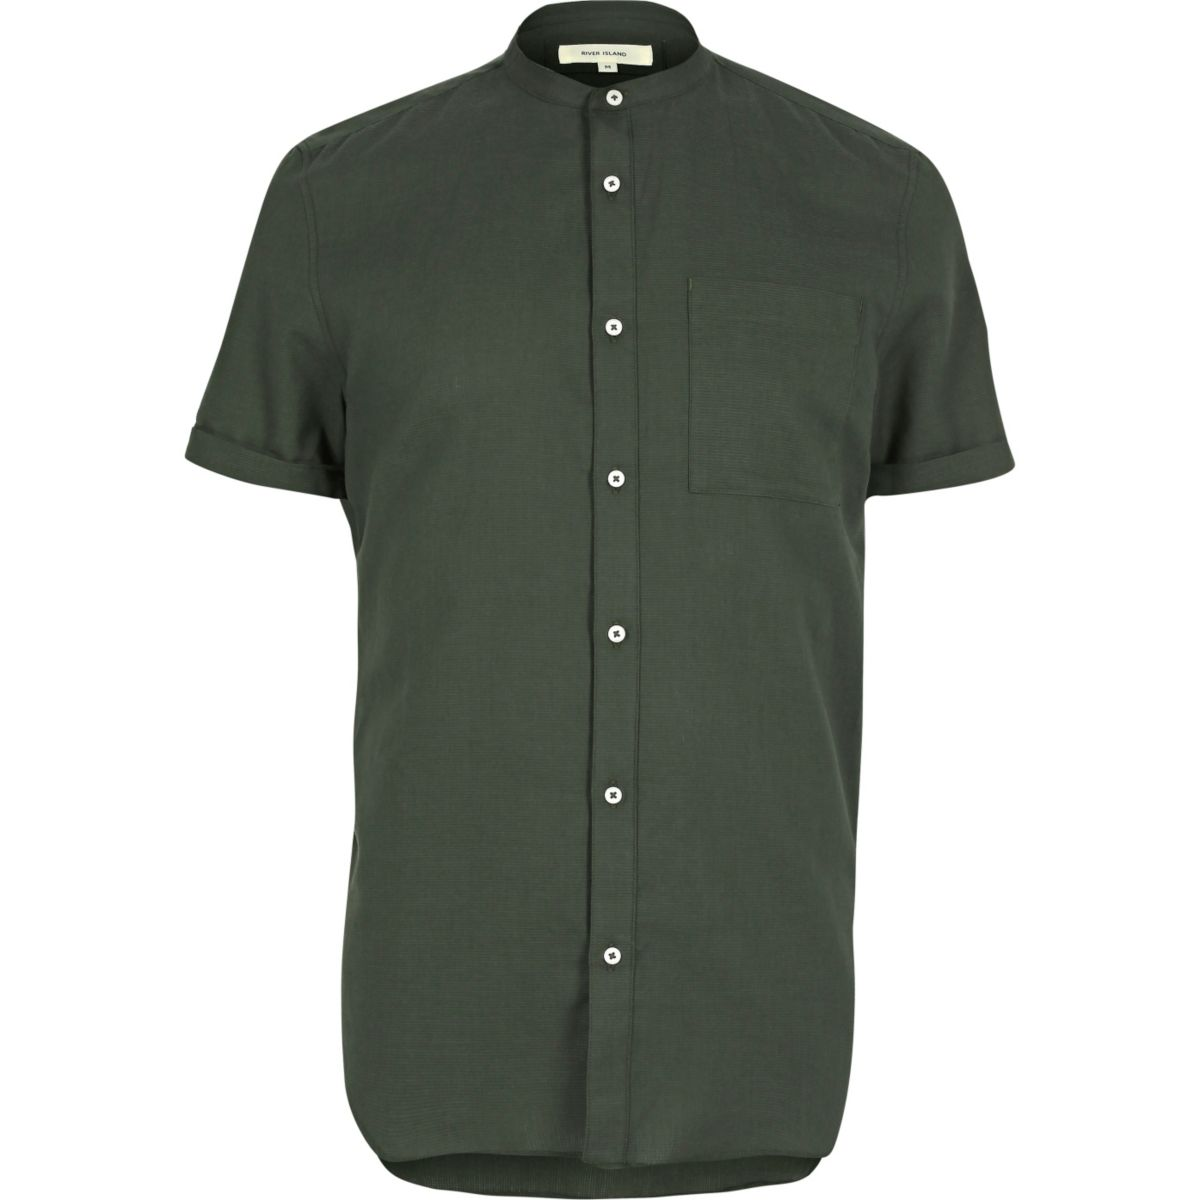 Green casual short sleeve grandad shirt